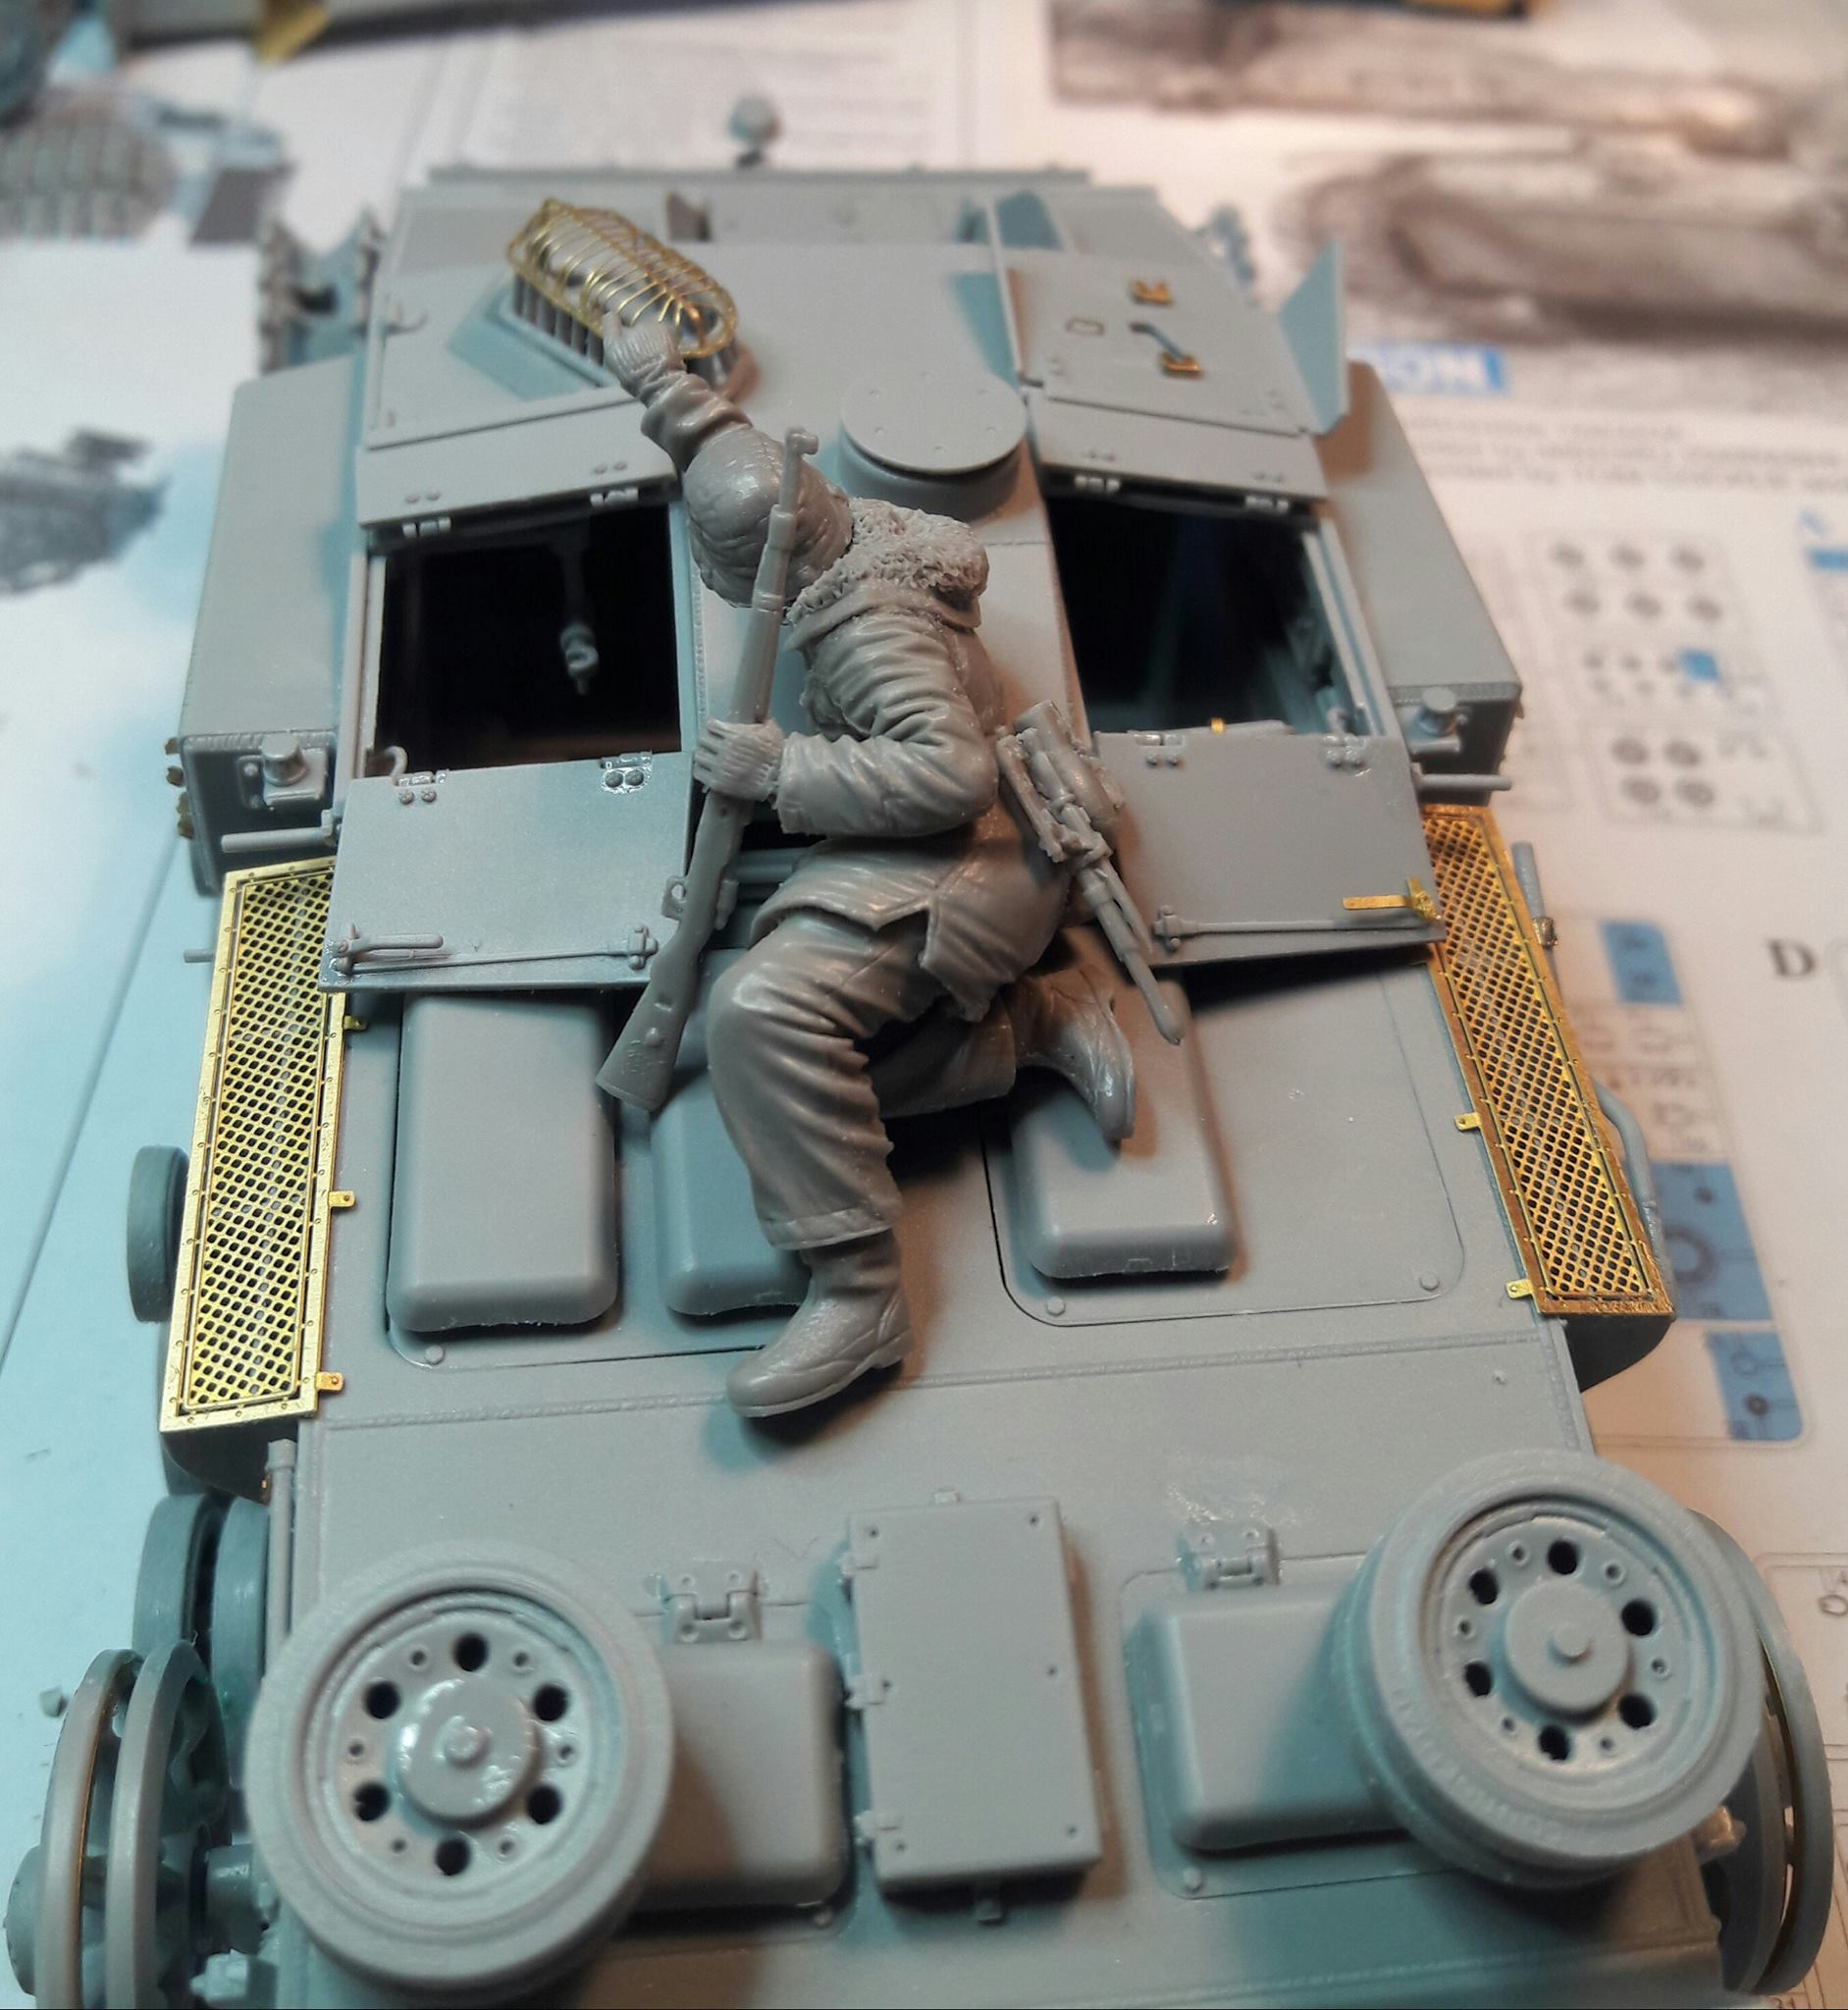 StuG.III Ausf.F/8 late production w/Winterketten - 1/35 - Page 2 7660462084134410212081171399098332067145o